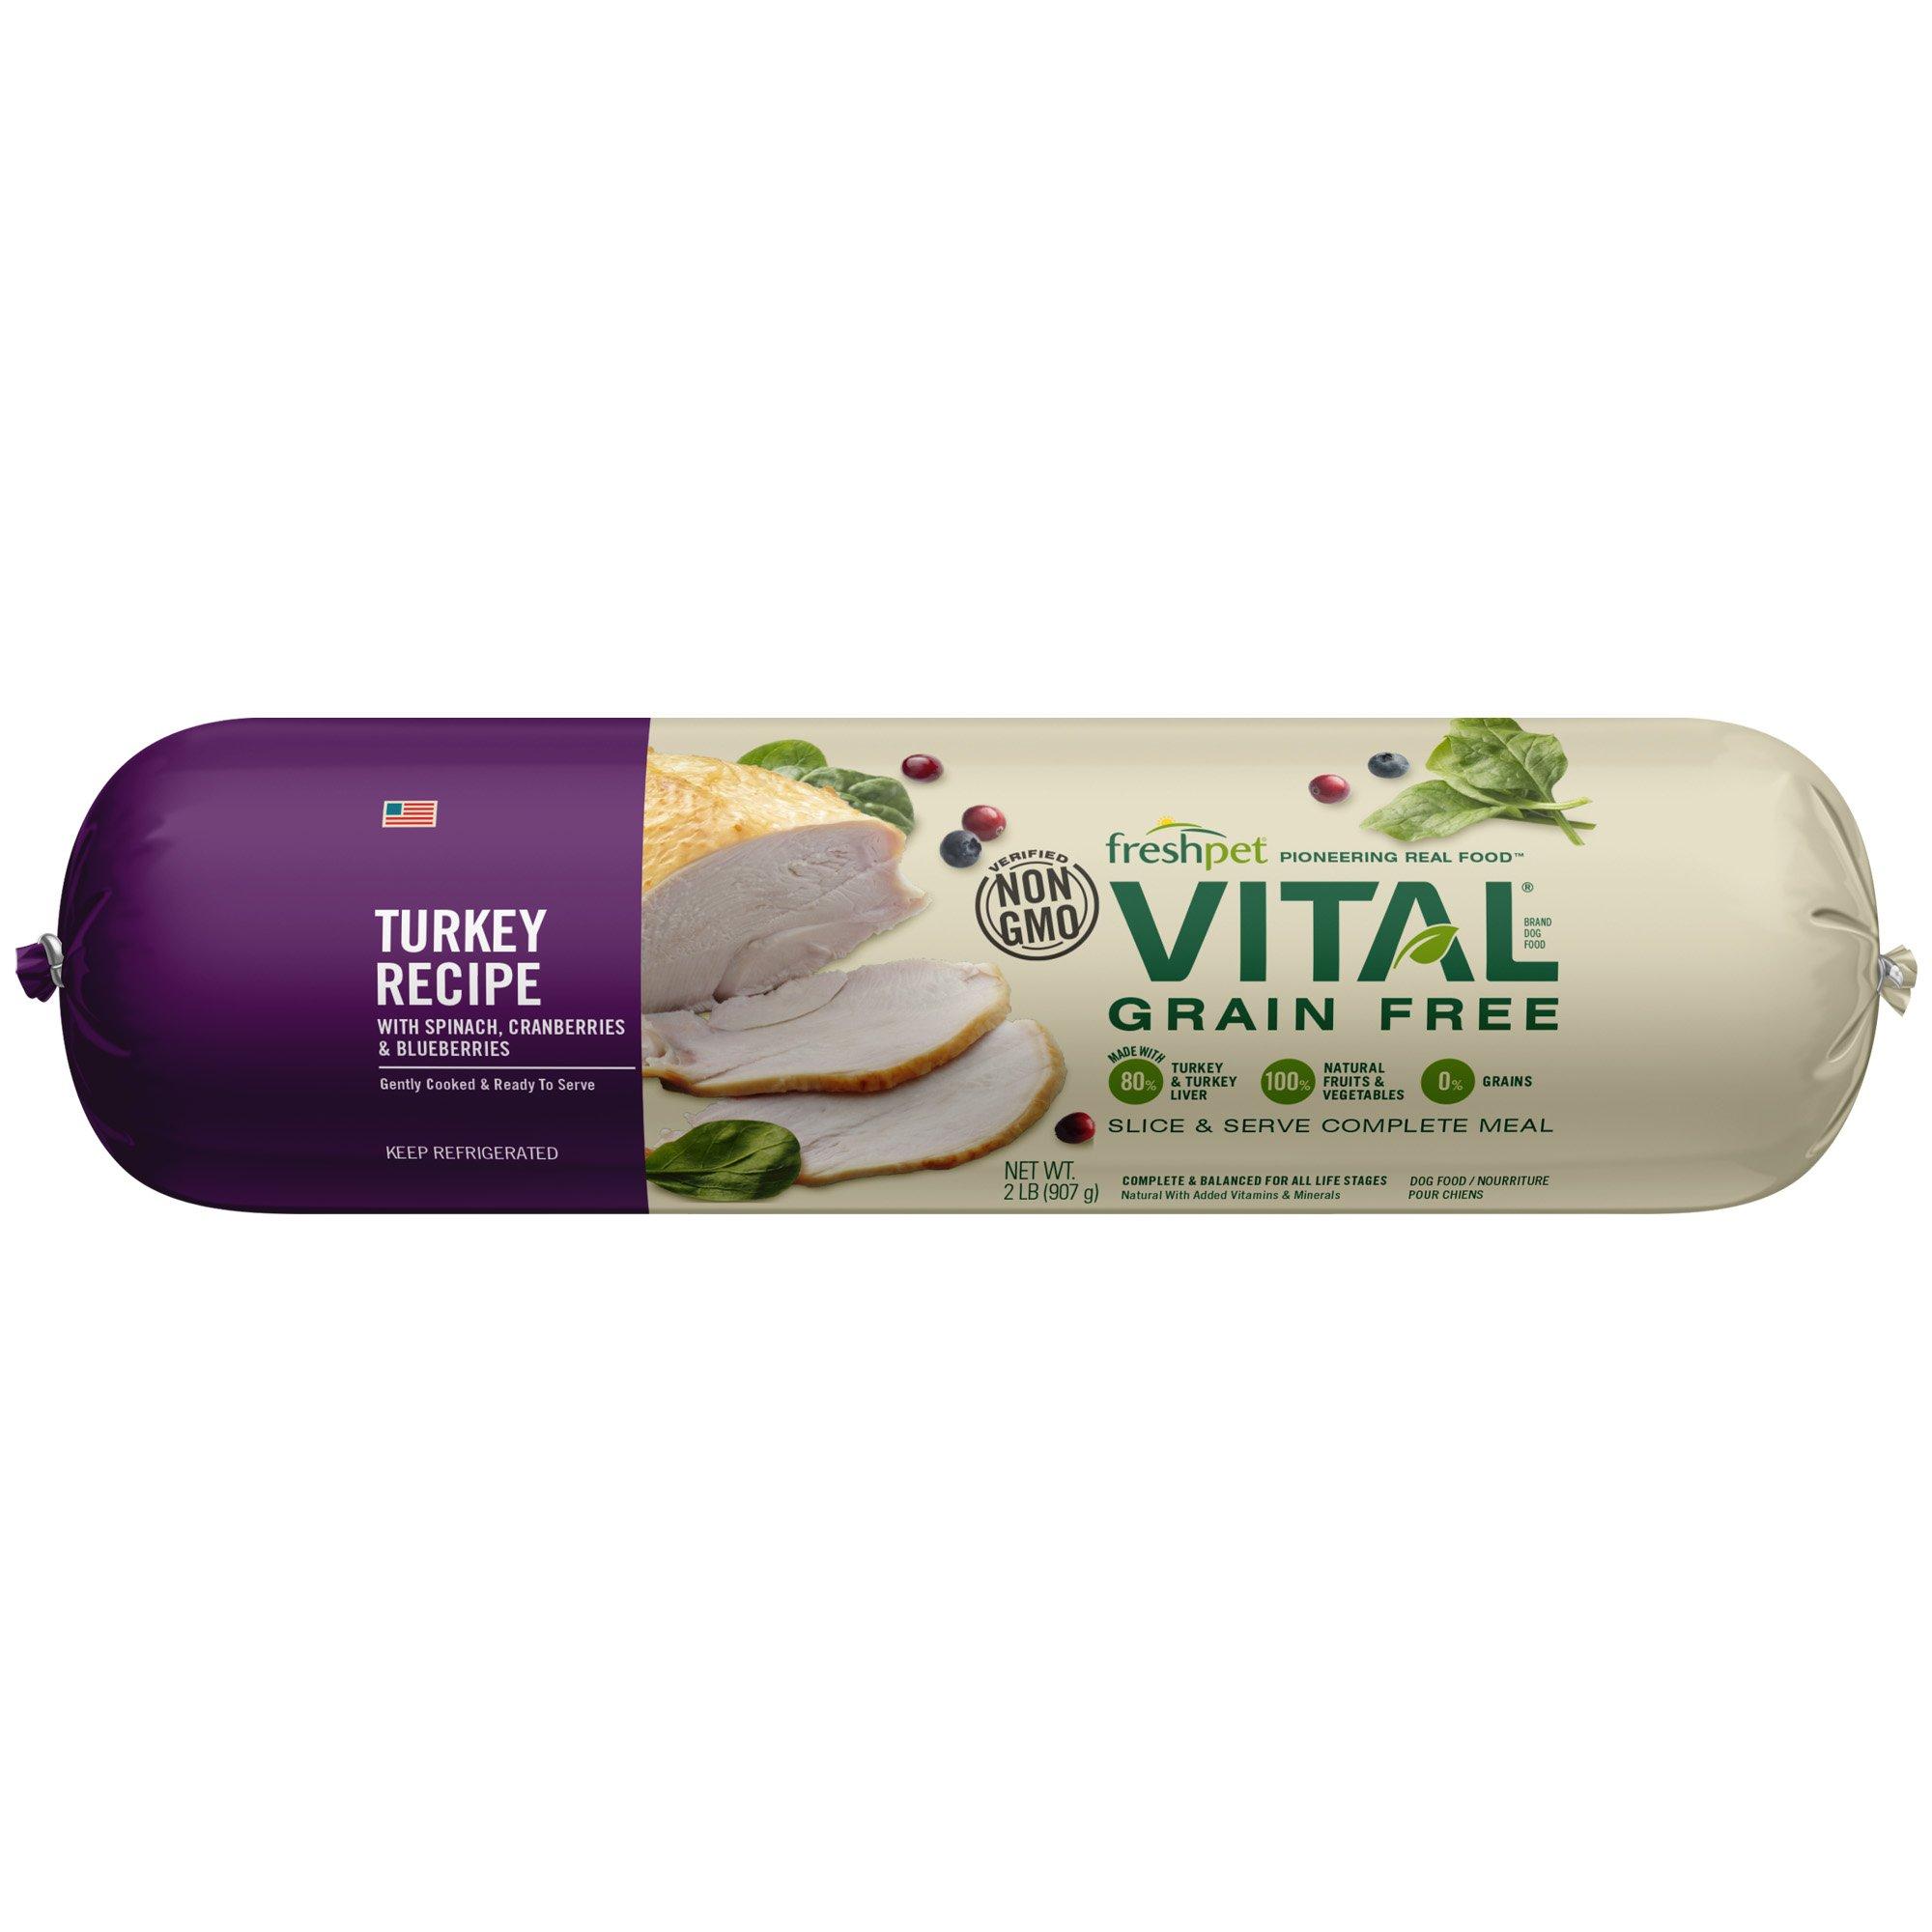 Freshpet Vital Grain Free Dog Food